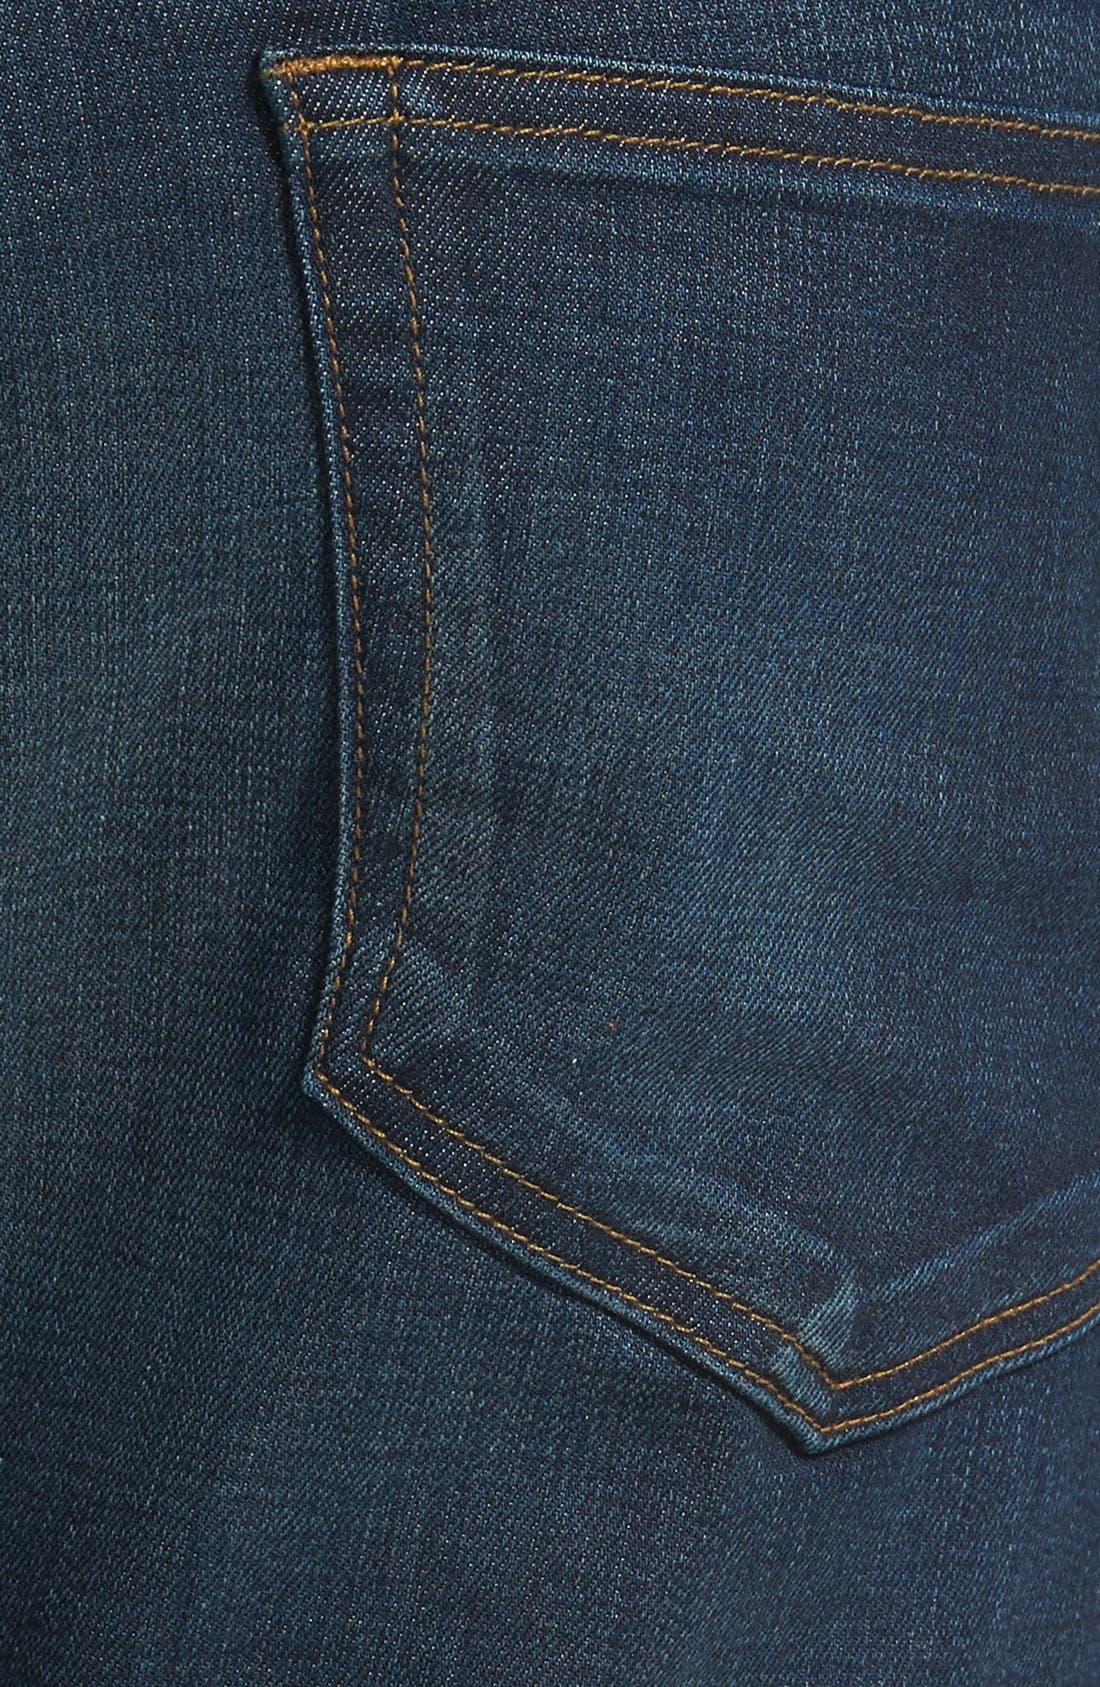 L'Homme Skinny Fit Jeans,                             Alternate thumbnail 4, color,                             Sierra